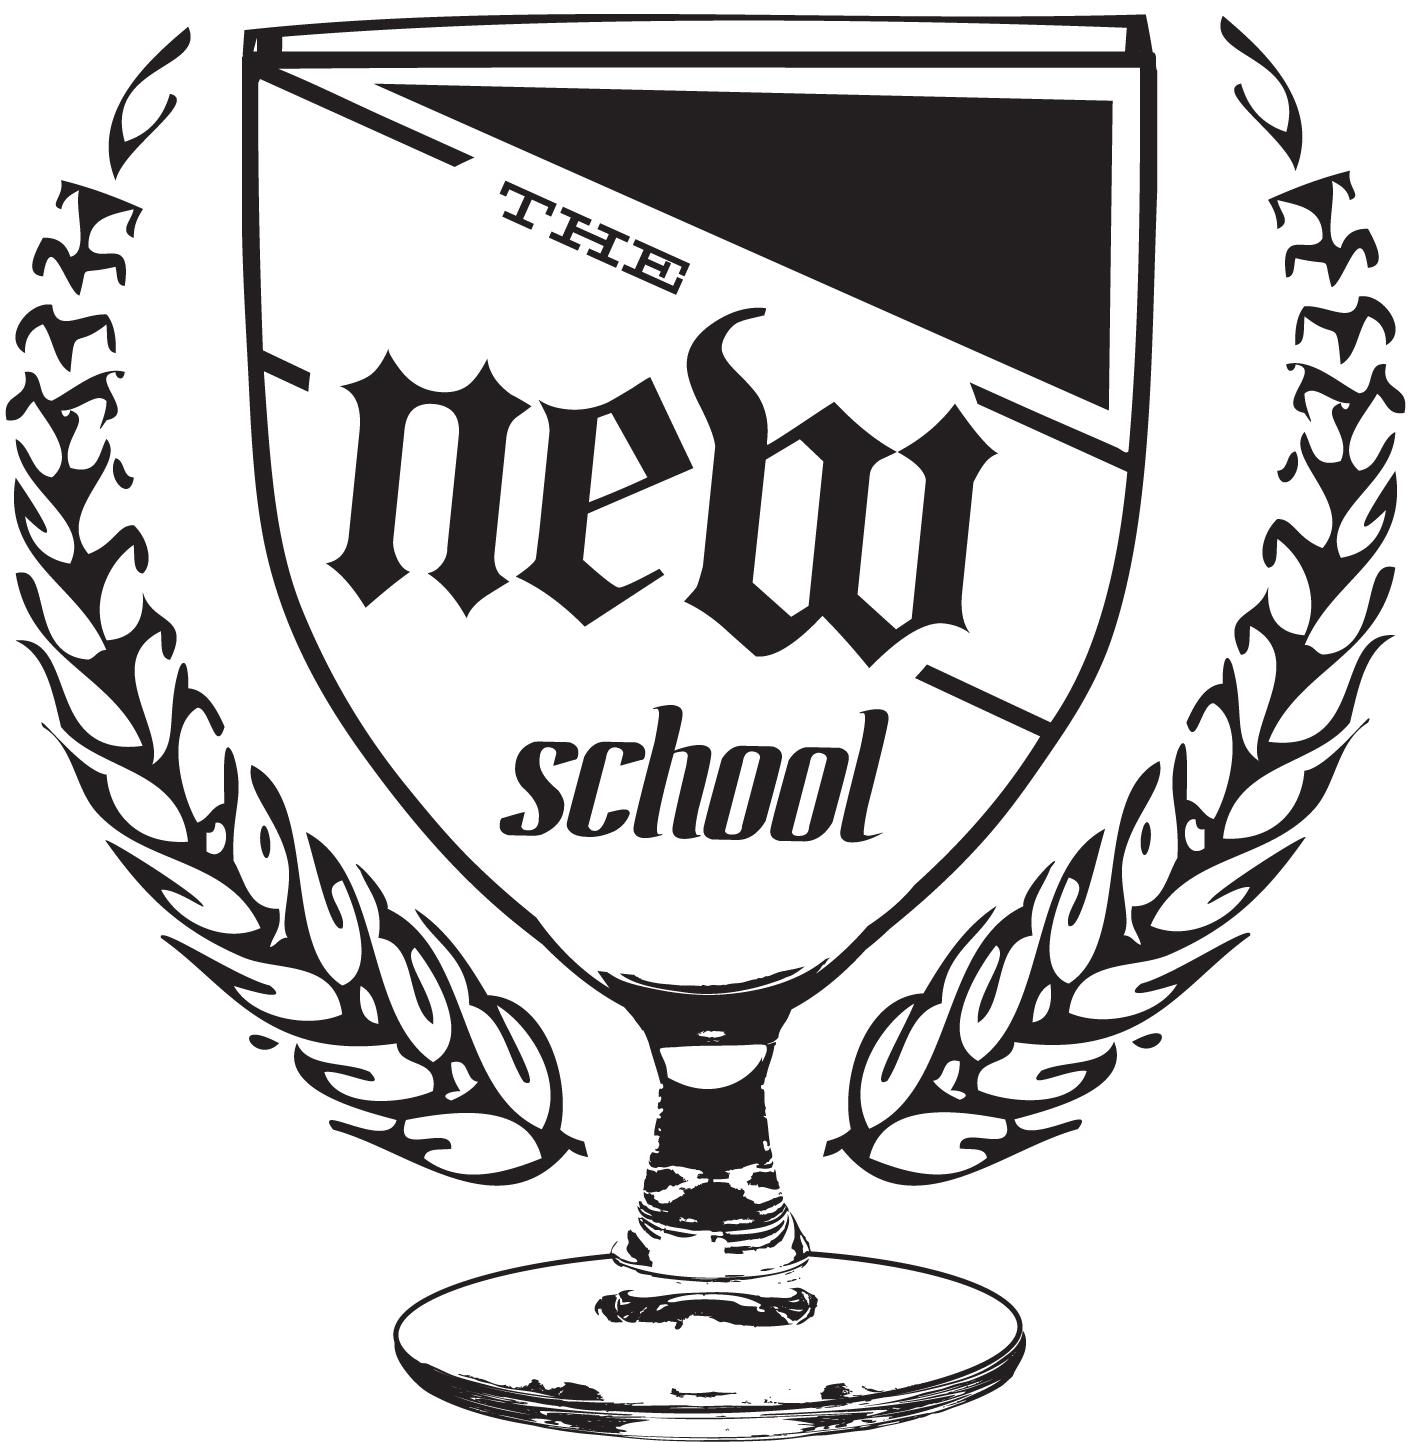 new school.jpg